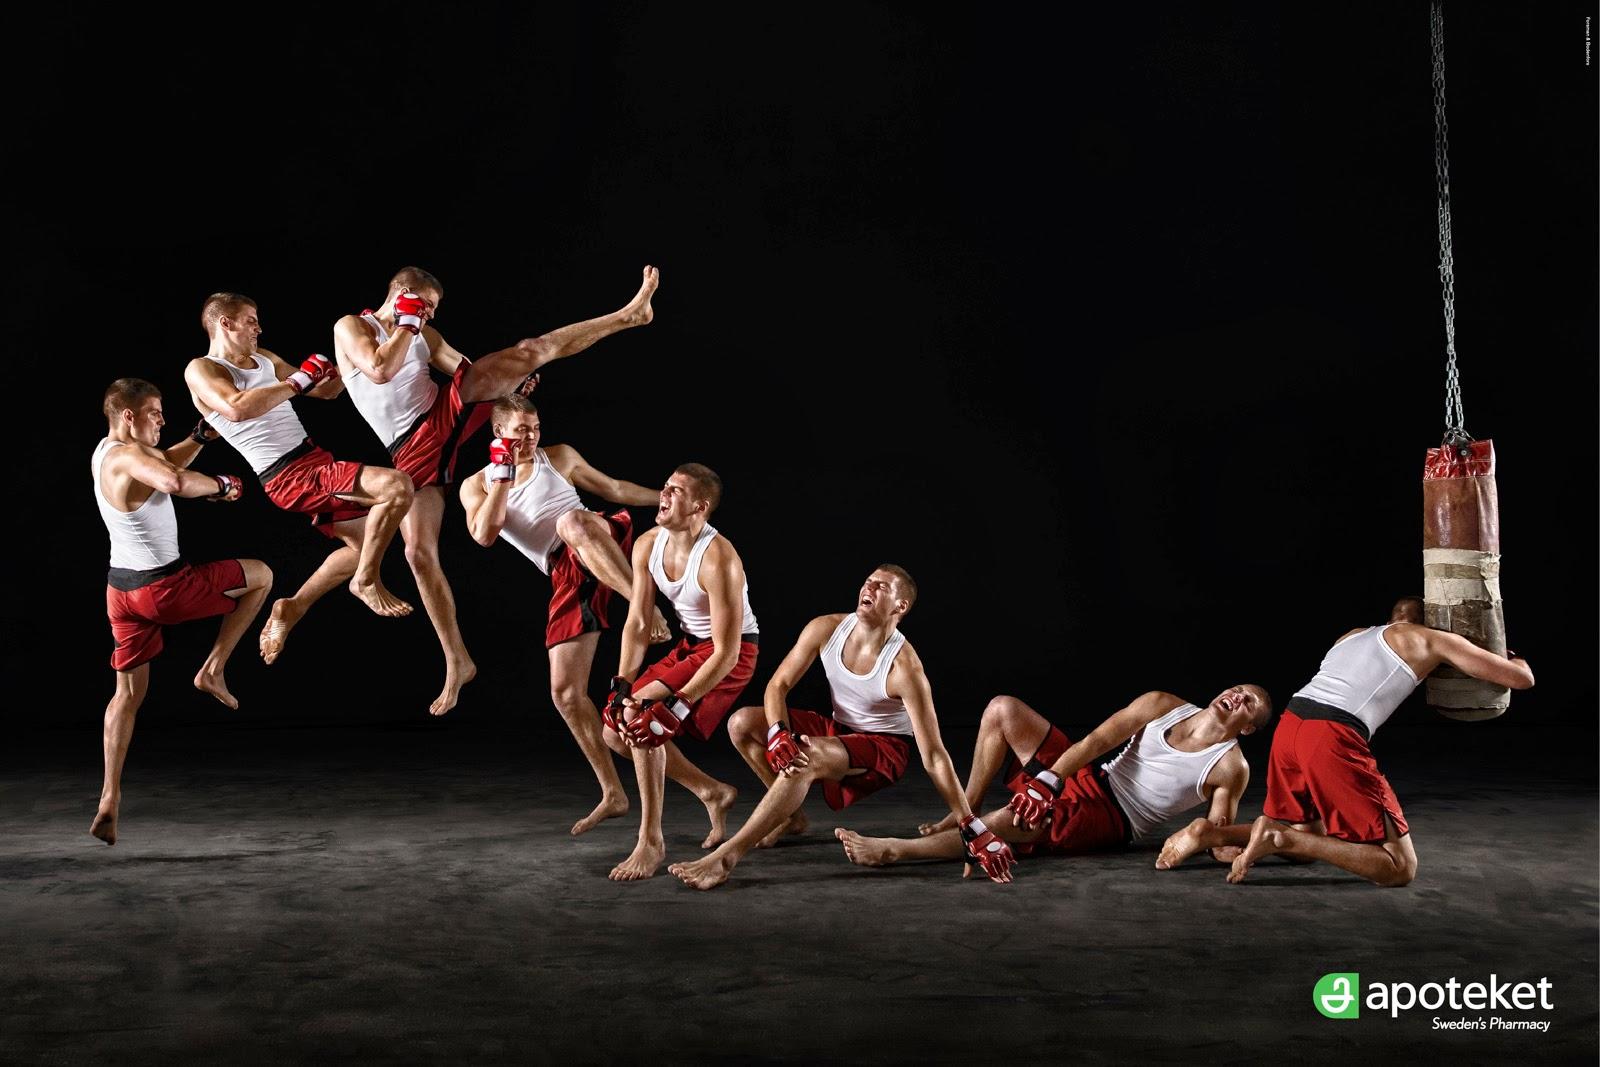 74] Kickboxing Wallpaper on WallpaperSafari 1600x1067